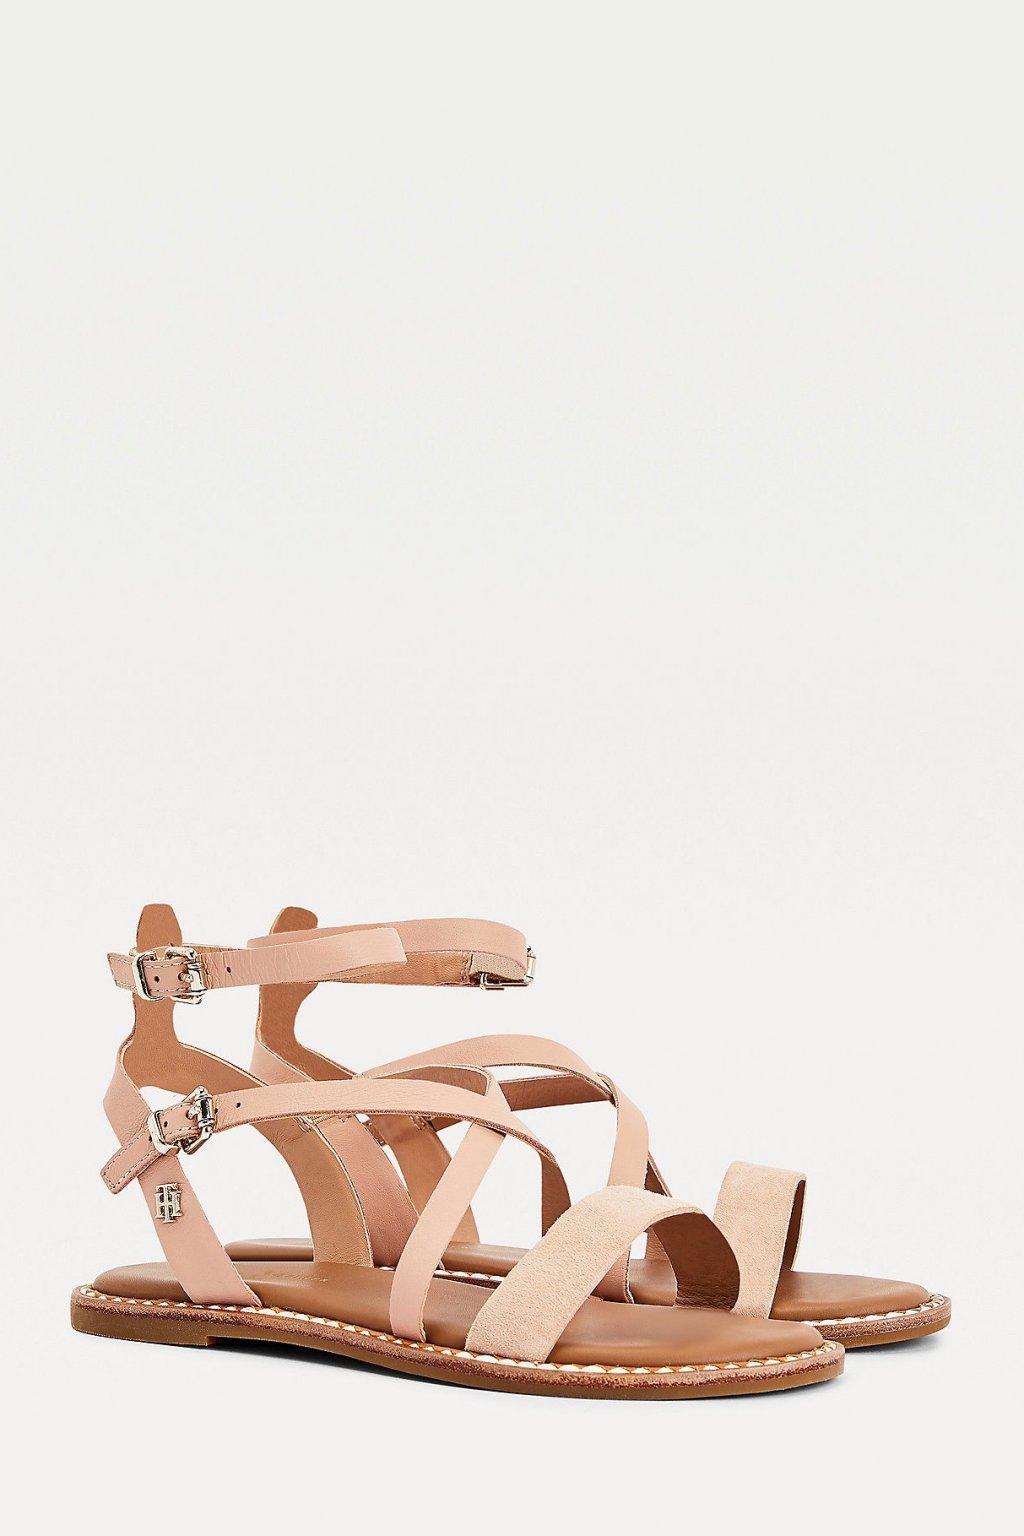 Tommy Hilfiger sandále dámské - béžové